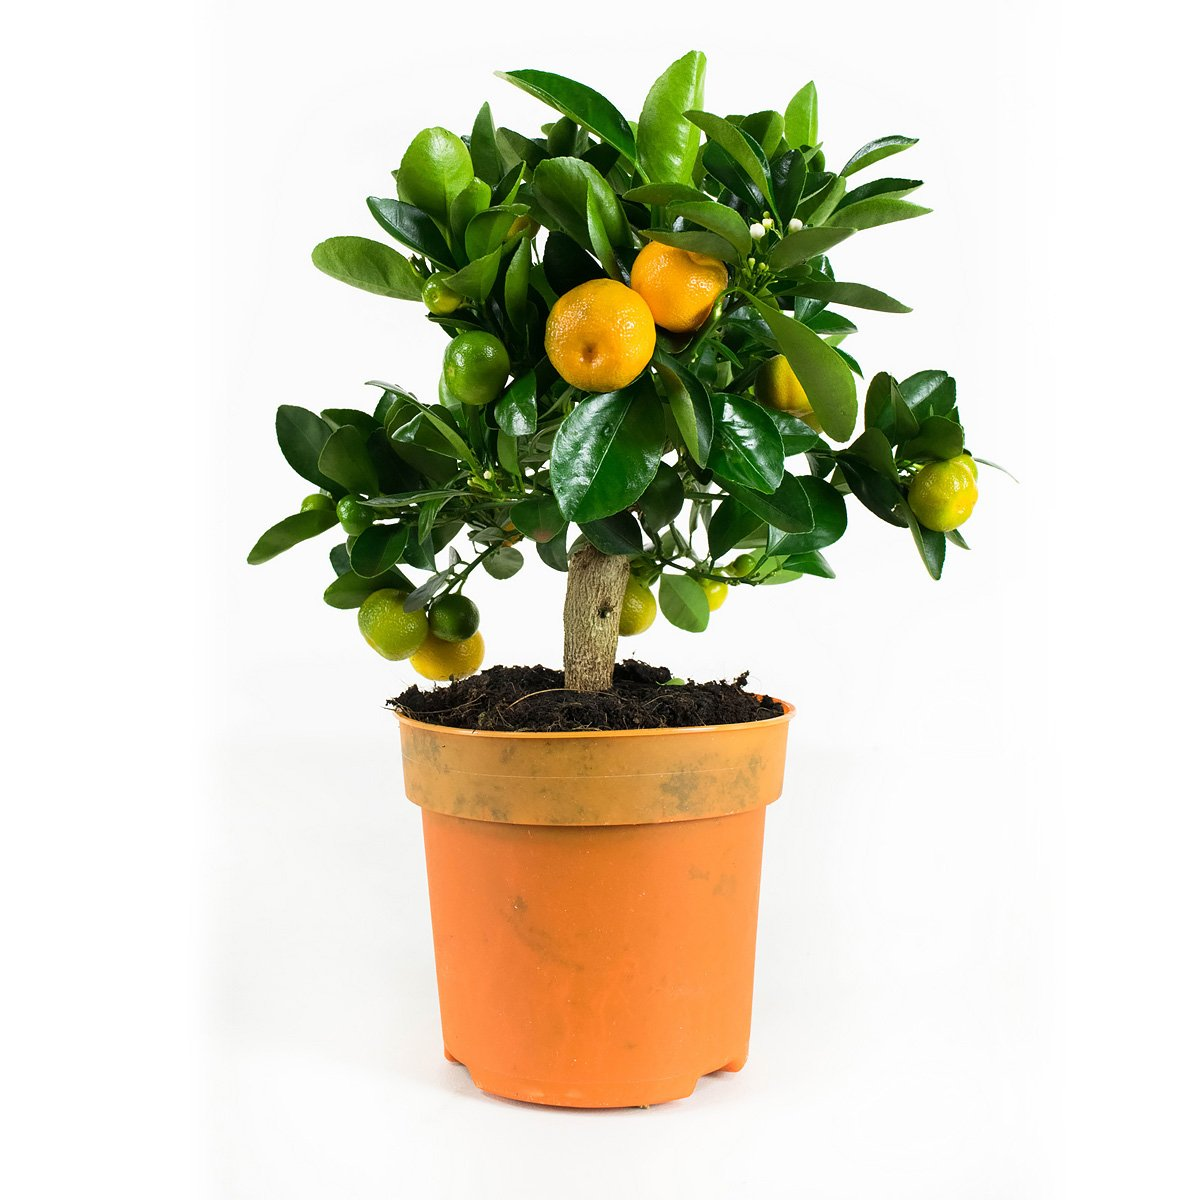 Calamondin or Calamansi with Anthracite Cylindrical Pot as a Set Fruit Plants BOTANICLY Citrus Microcarpa Height: 35 cm